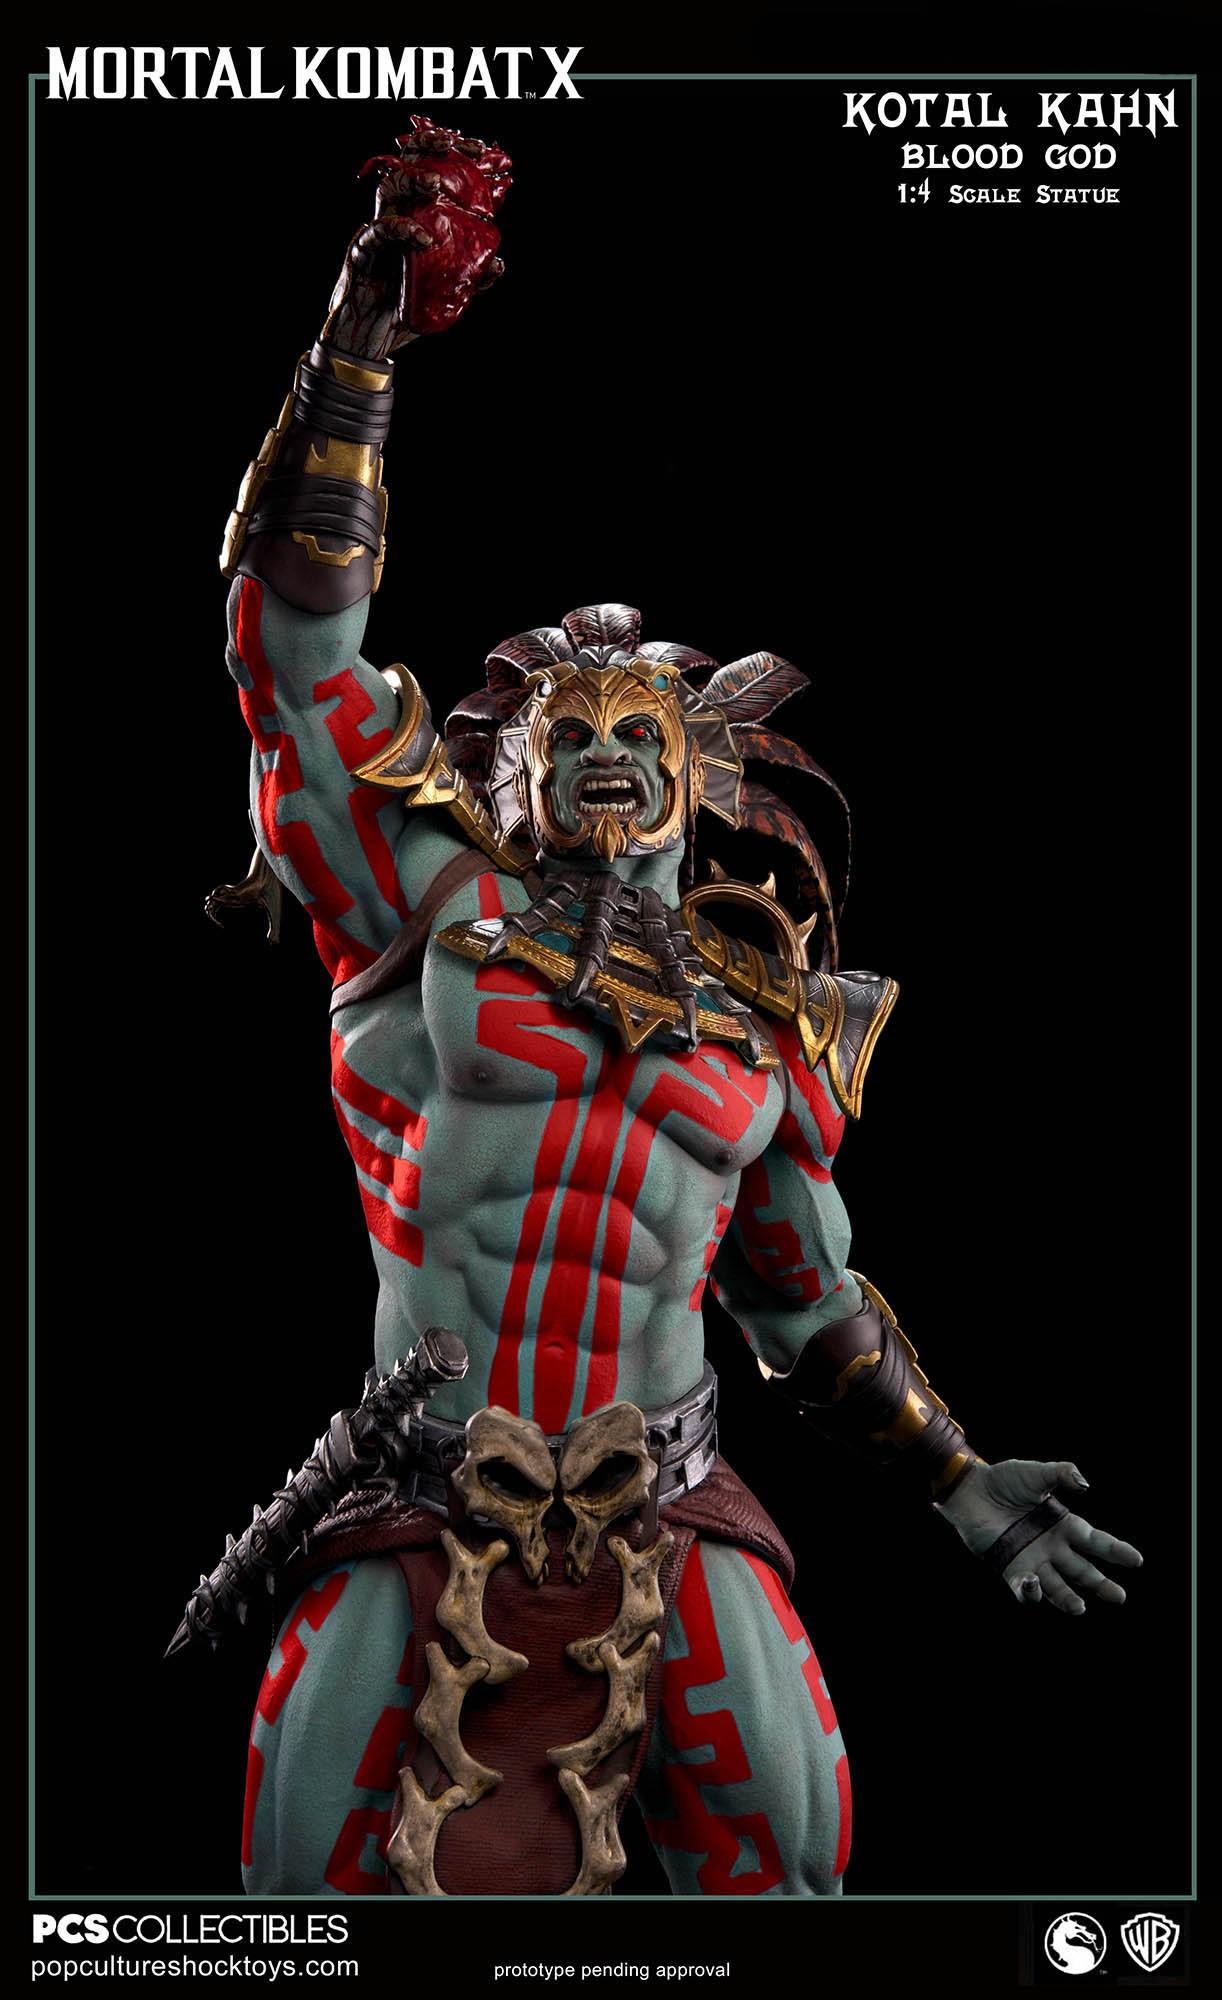 [Pop Culture Shock] Mortal Kombat X: Kotal Kahn 1:4 scale PCS-Kotal-Kahn-Blood-God-010